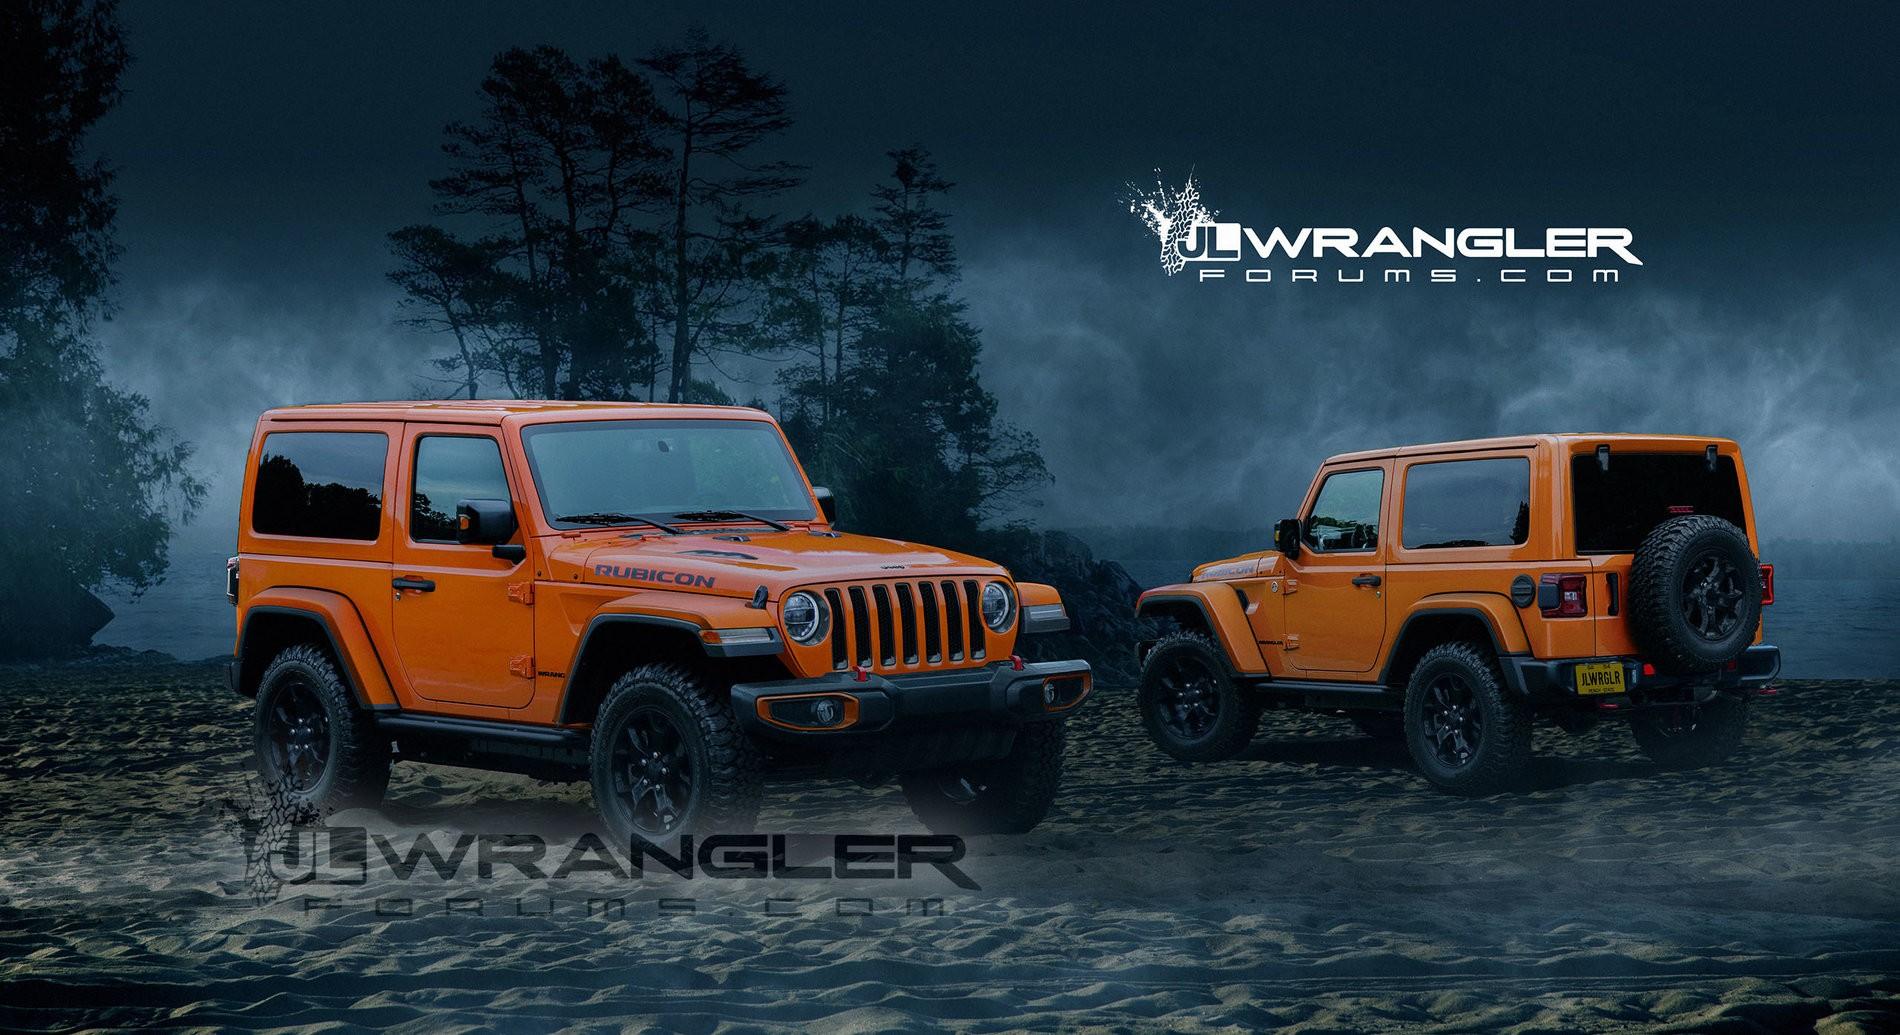 ... 2018 Jeep Wrangler (JL) rendering based on spy photos ...